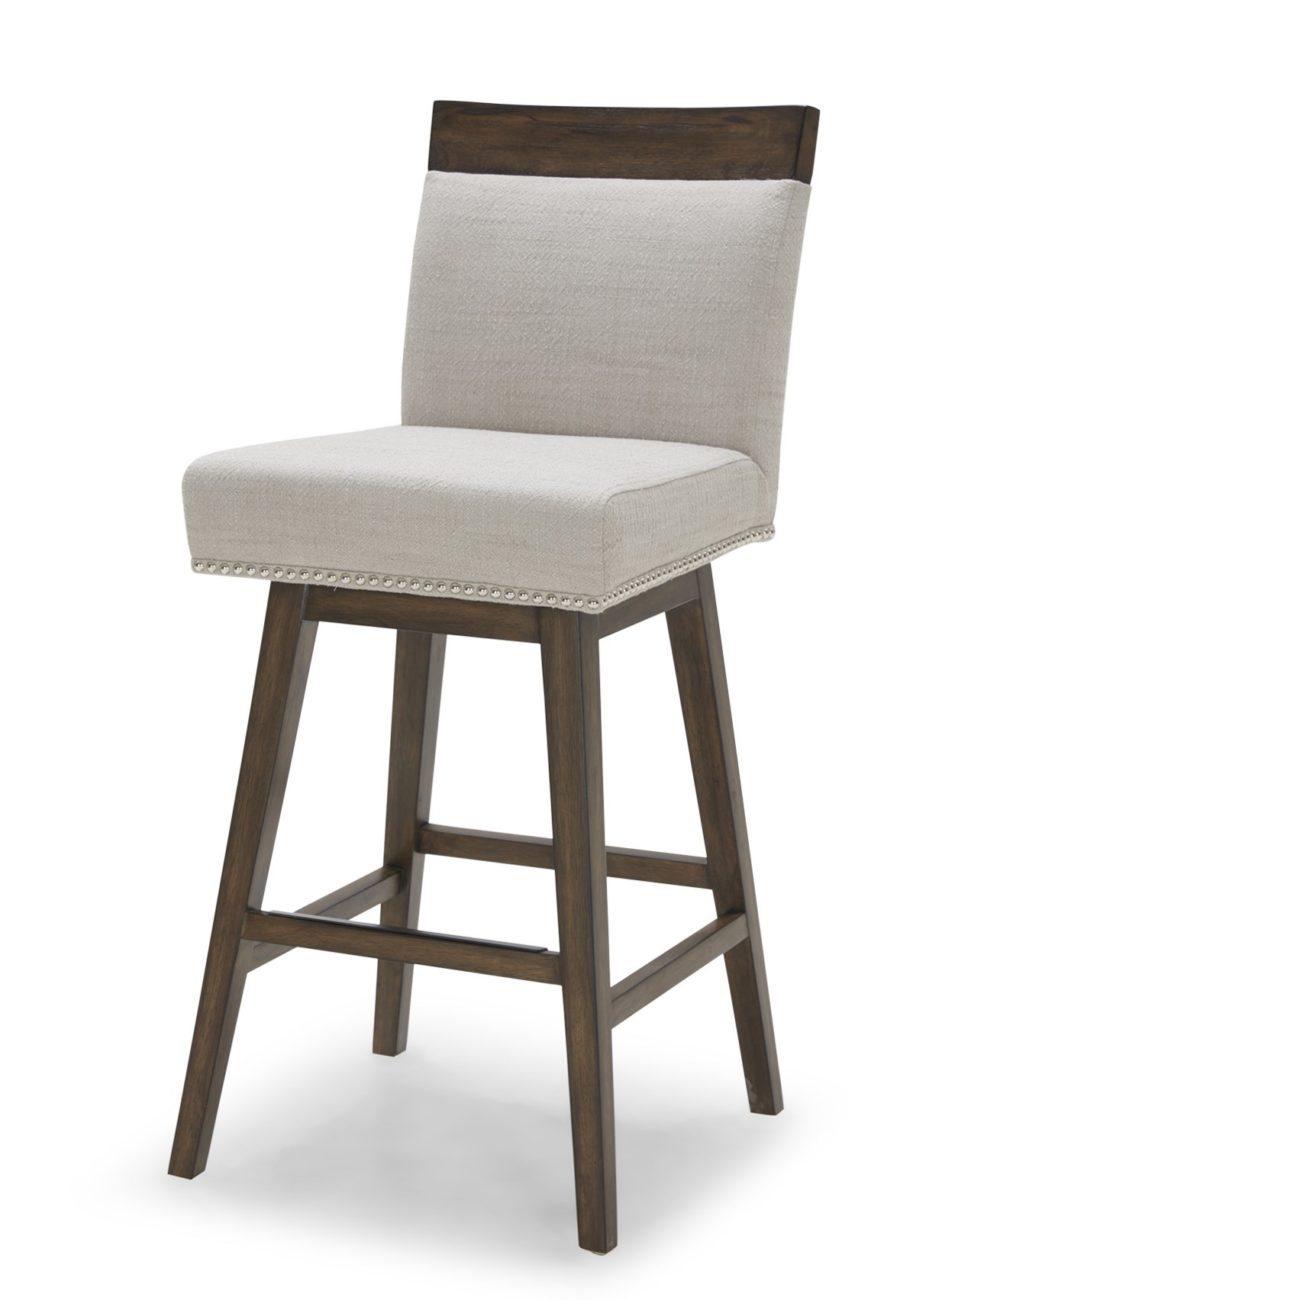 Fairhope Barstool Horizon Home Furniture : ep33 Y1321InPixio from horizonhomefurniture.net size 1300 x 1300 jpeg 72kB